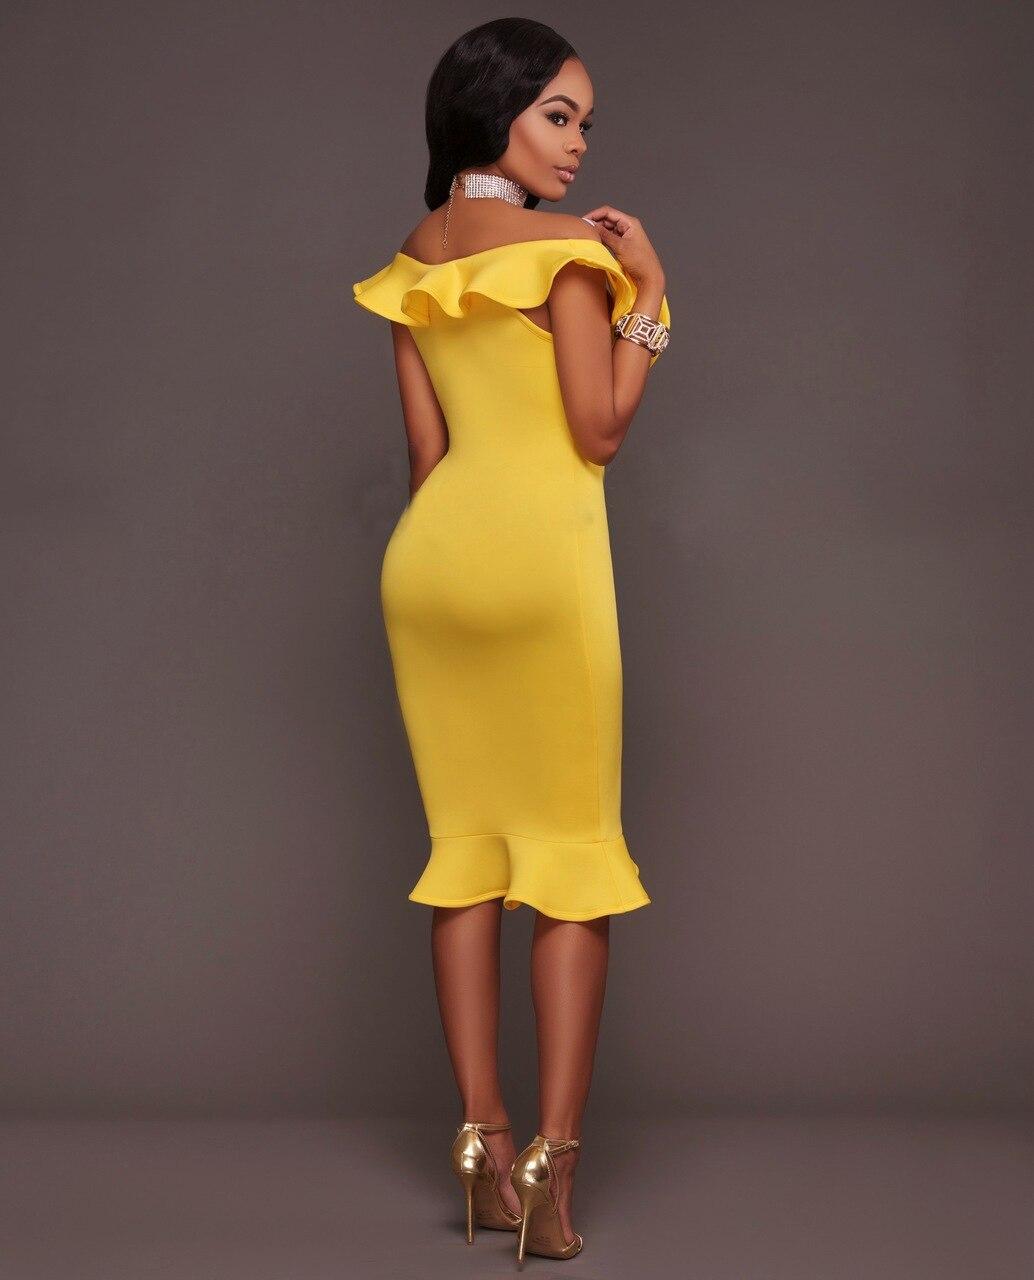 2017 Fashion Women Sexy Ruffles Dress Deep V-neck Slim Sleeveless Bodycon Dress Summer Party Yellow Casual Elegant Dresses 8